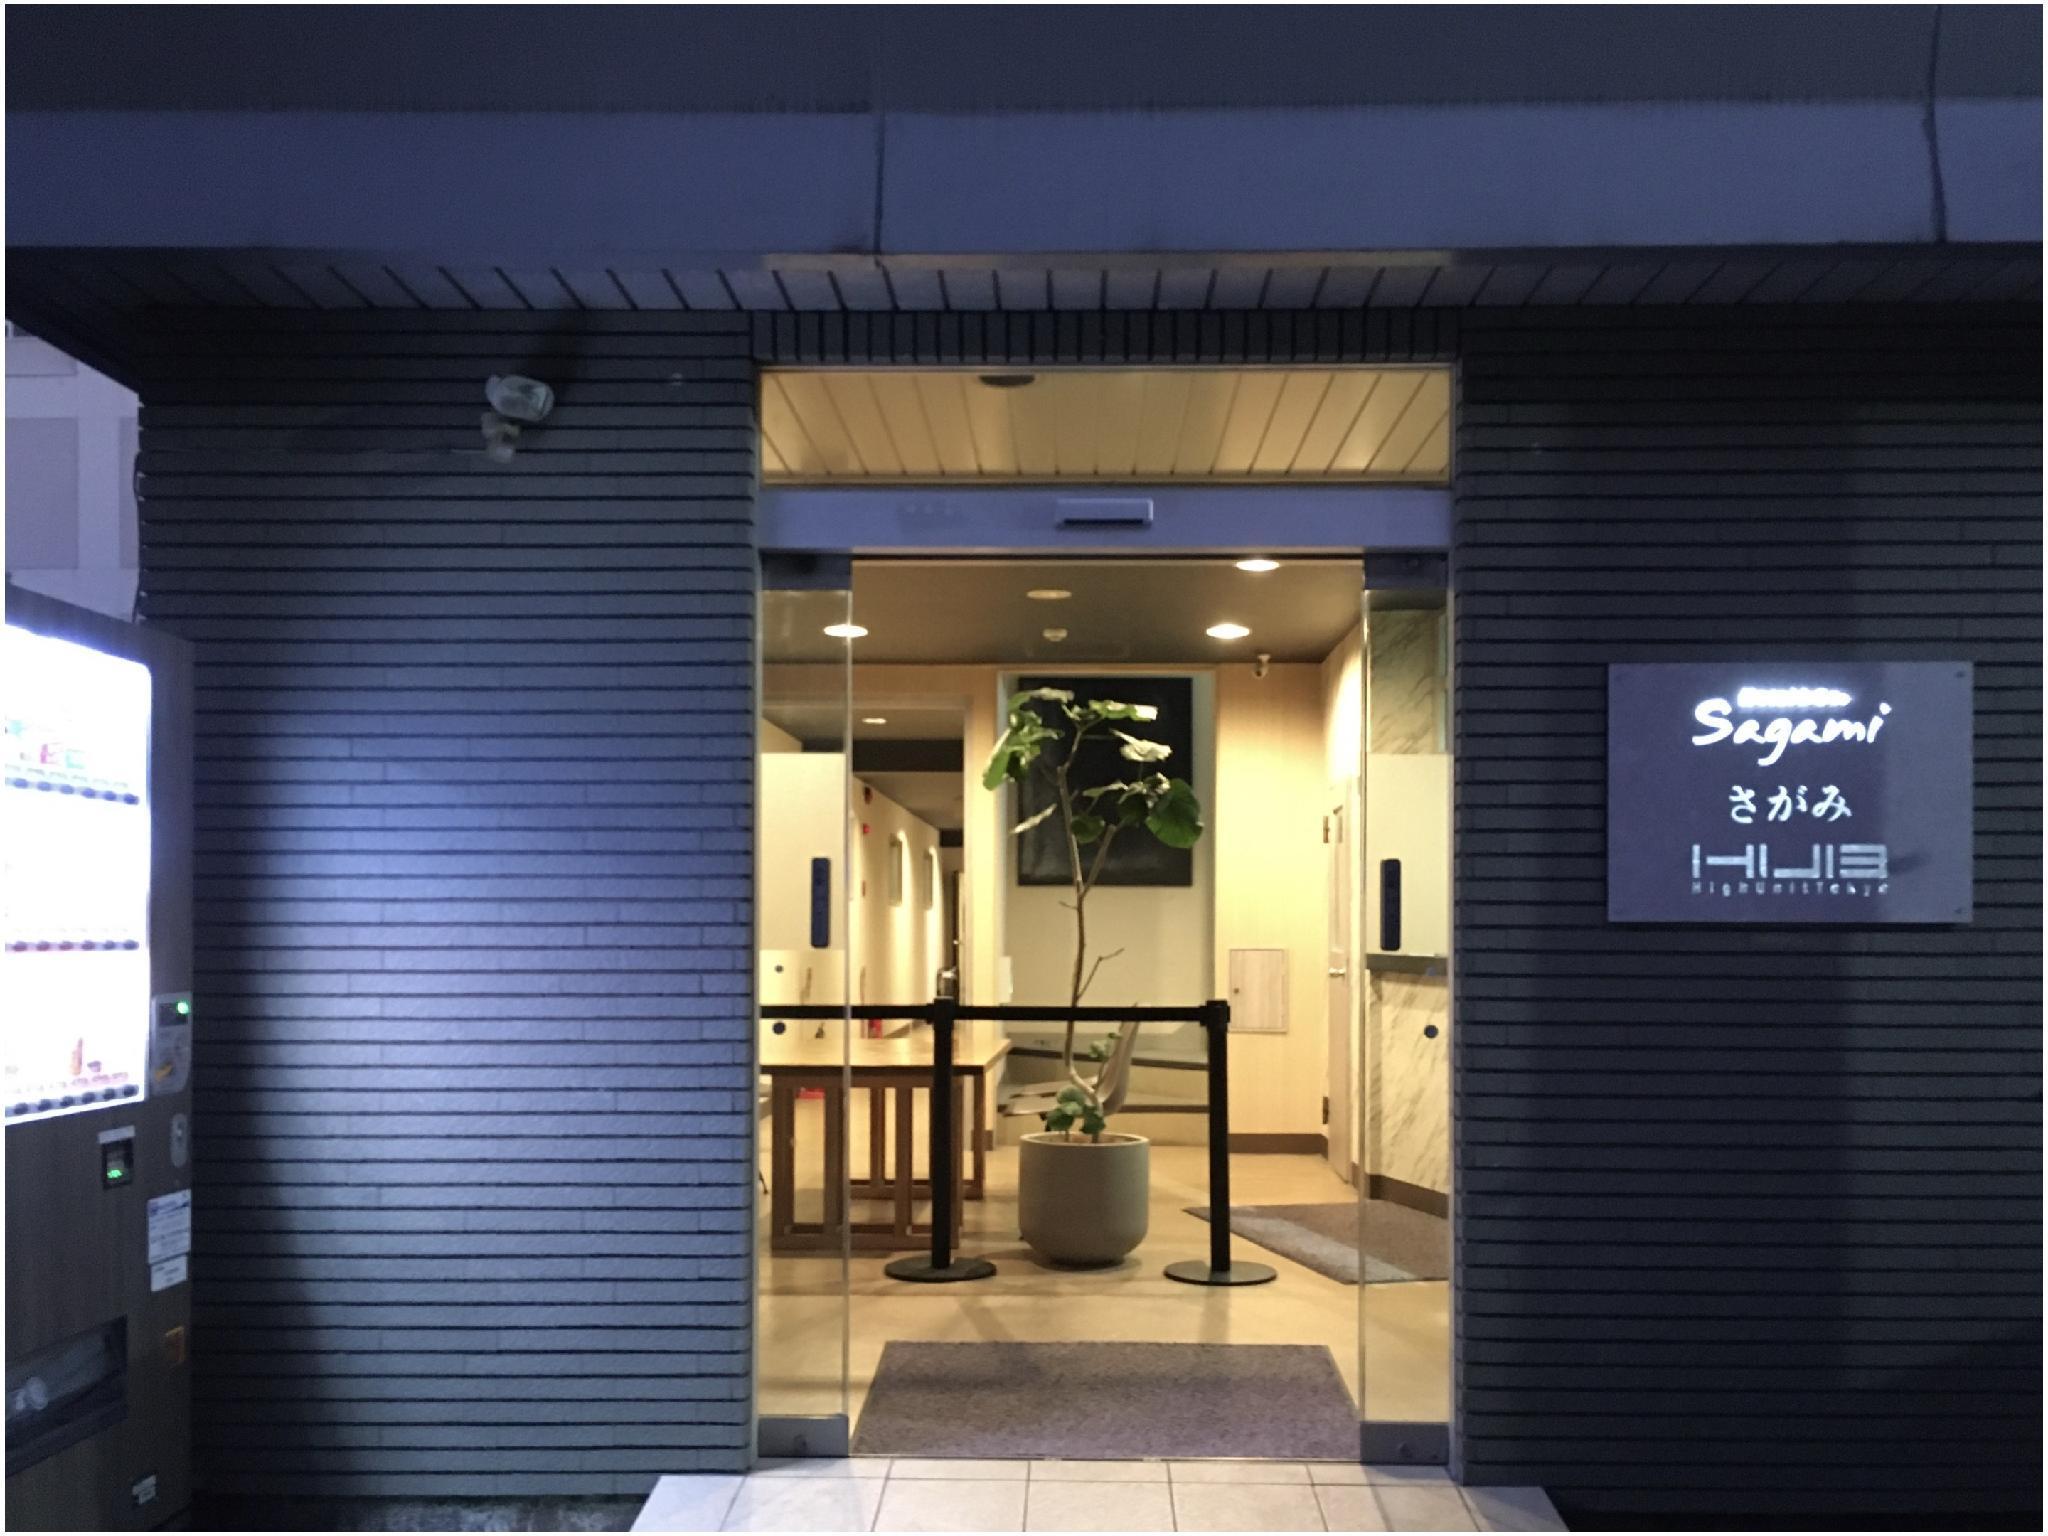 Hotel Sagami